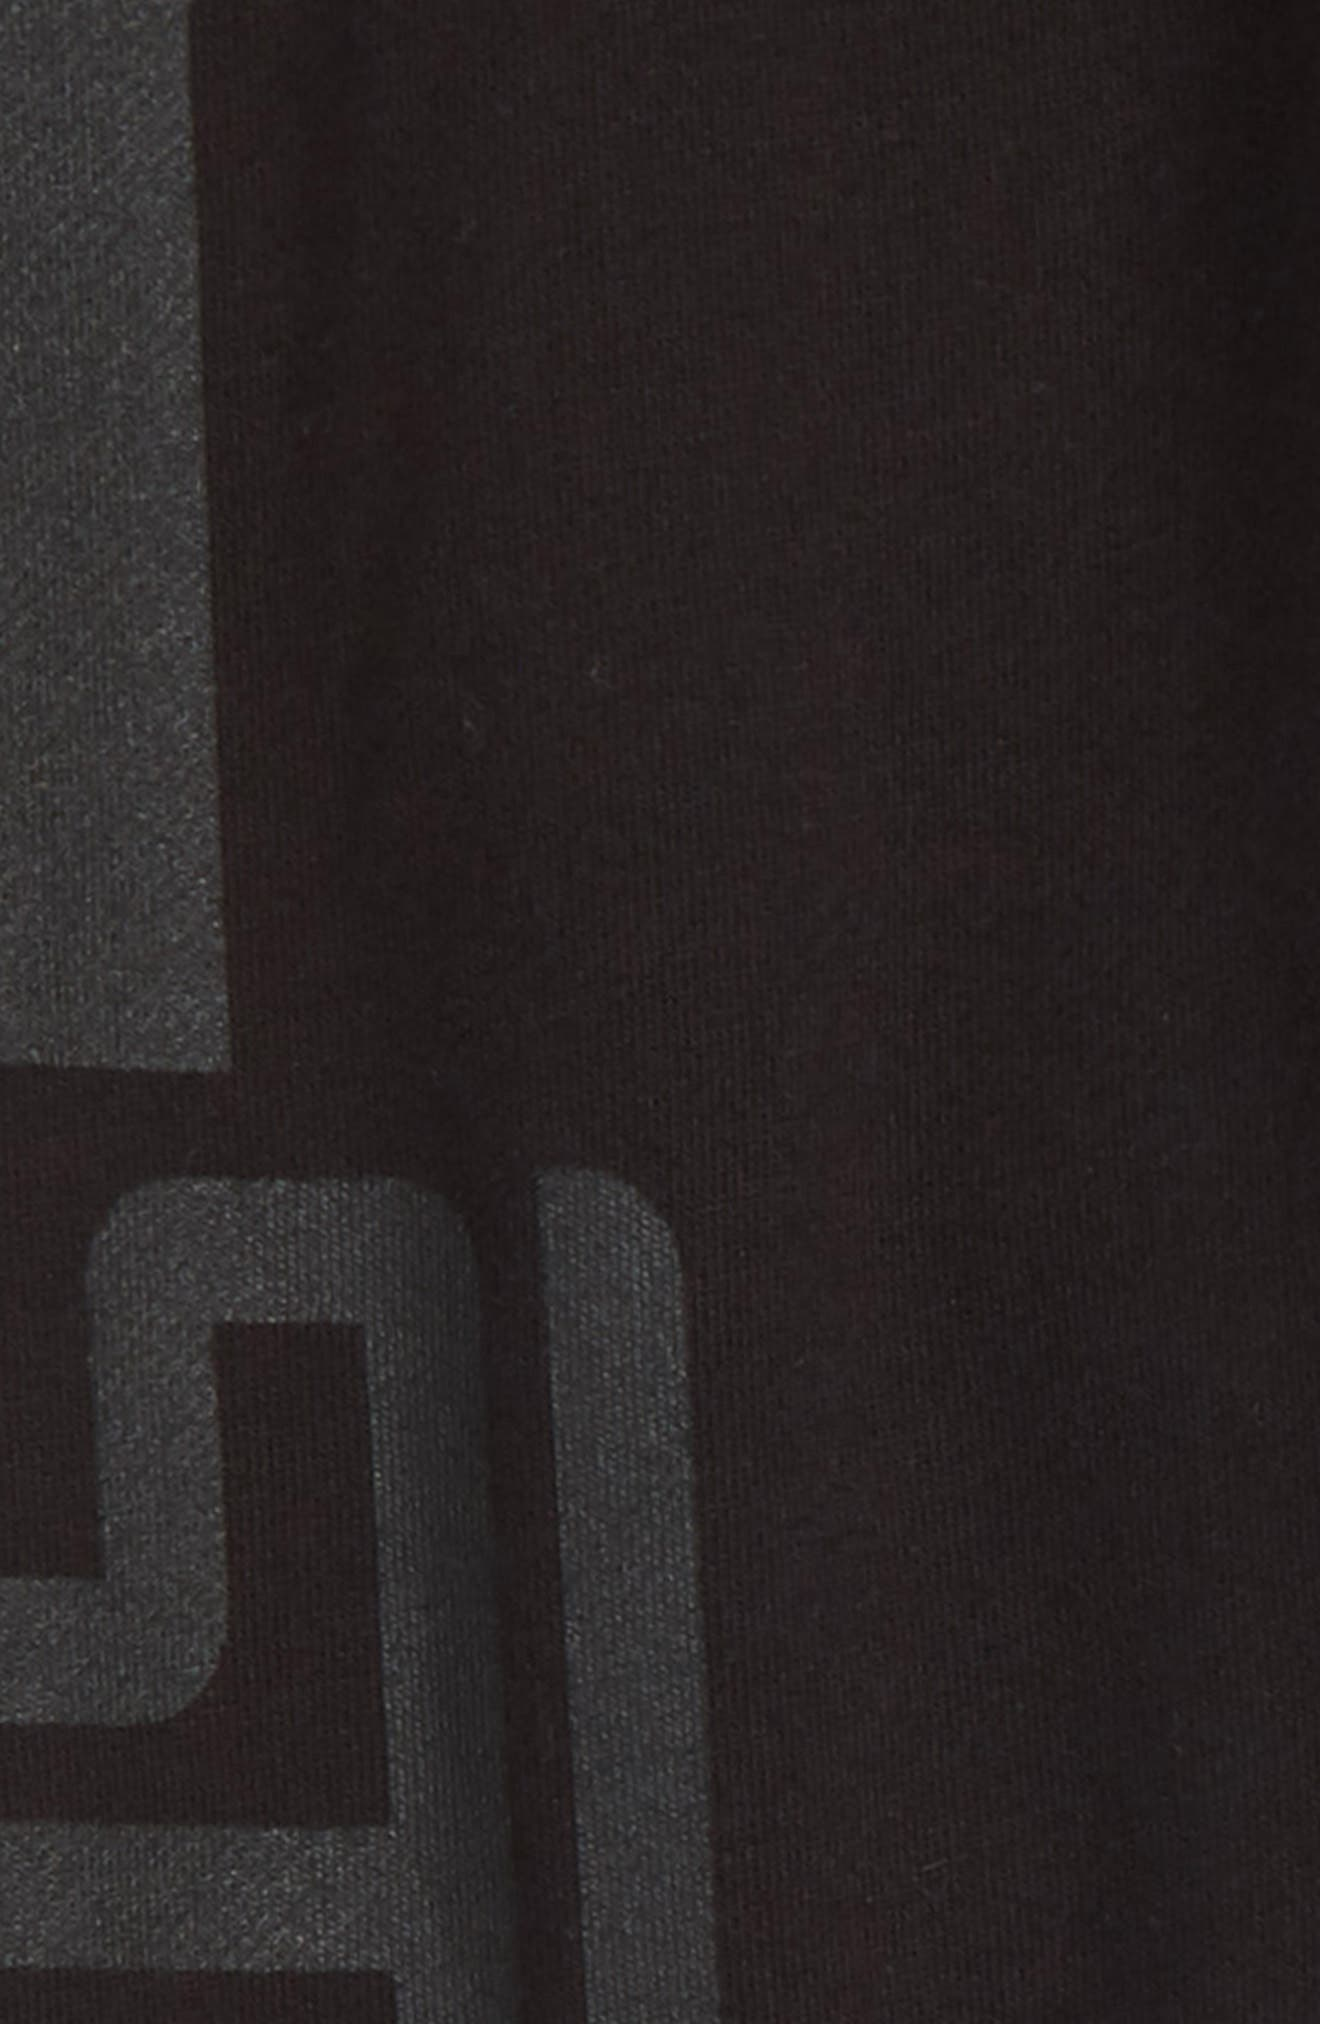 Stella McCartney Logo Sweatpants,                             Alternate thumbnail 3, color,                             BLACK